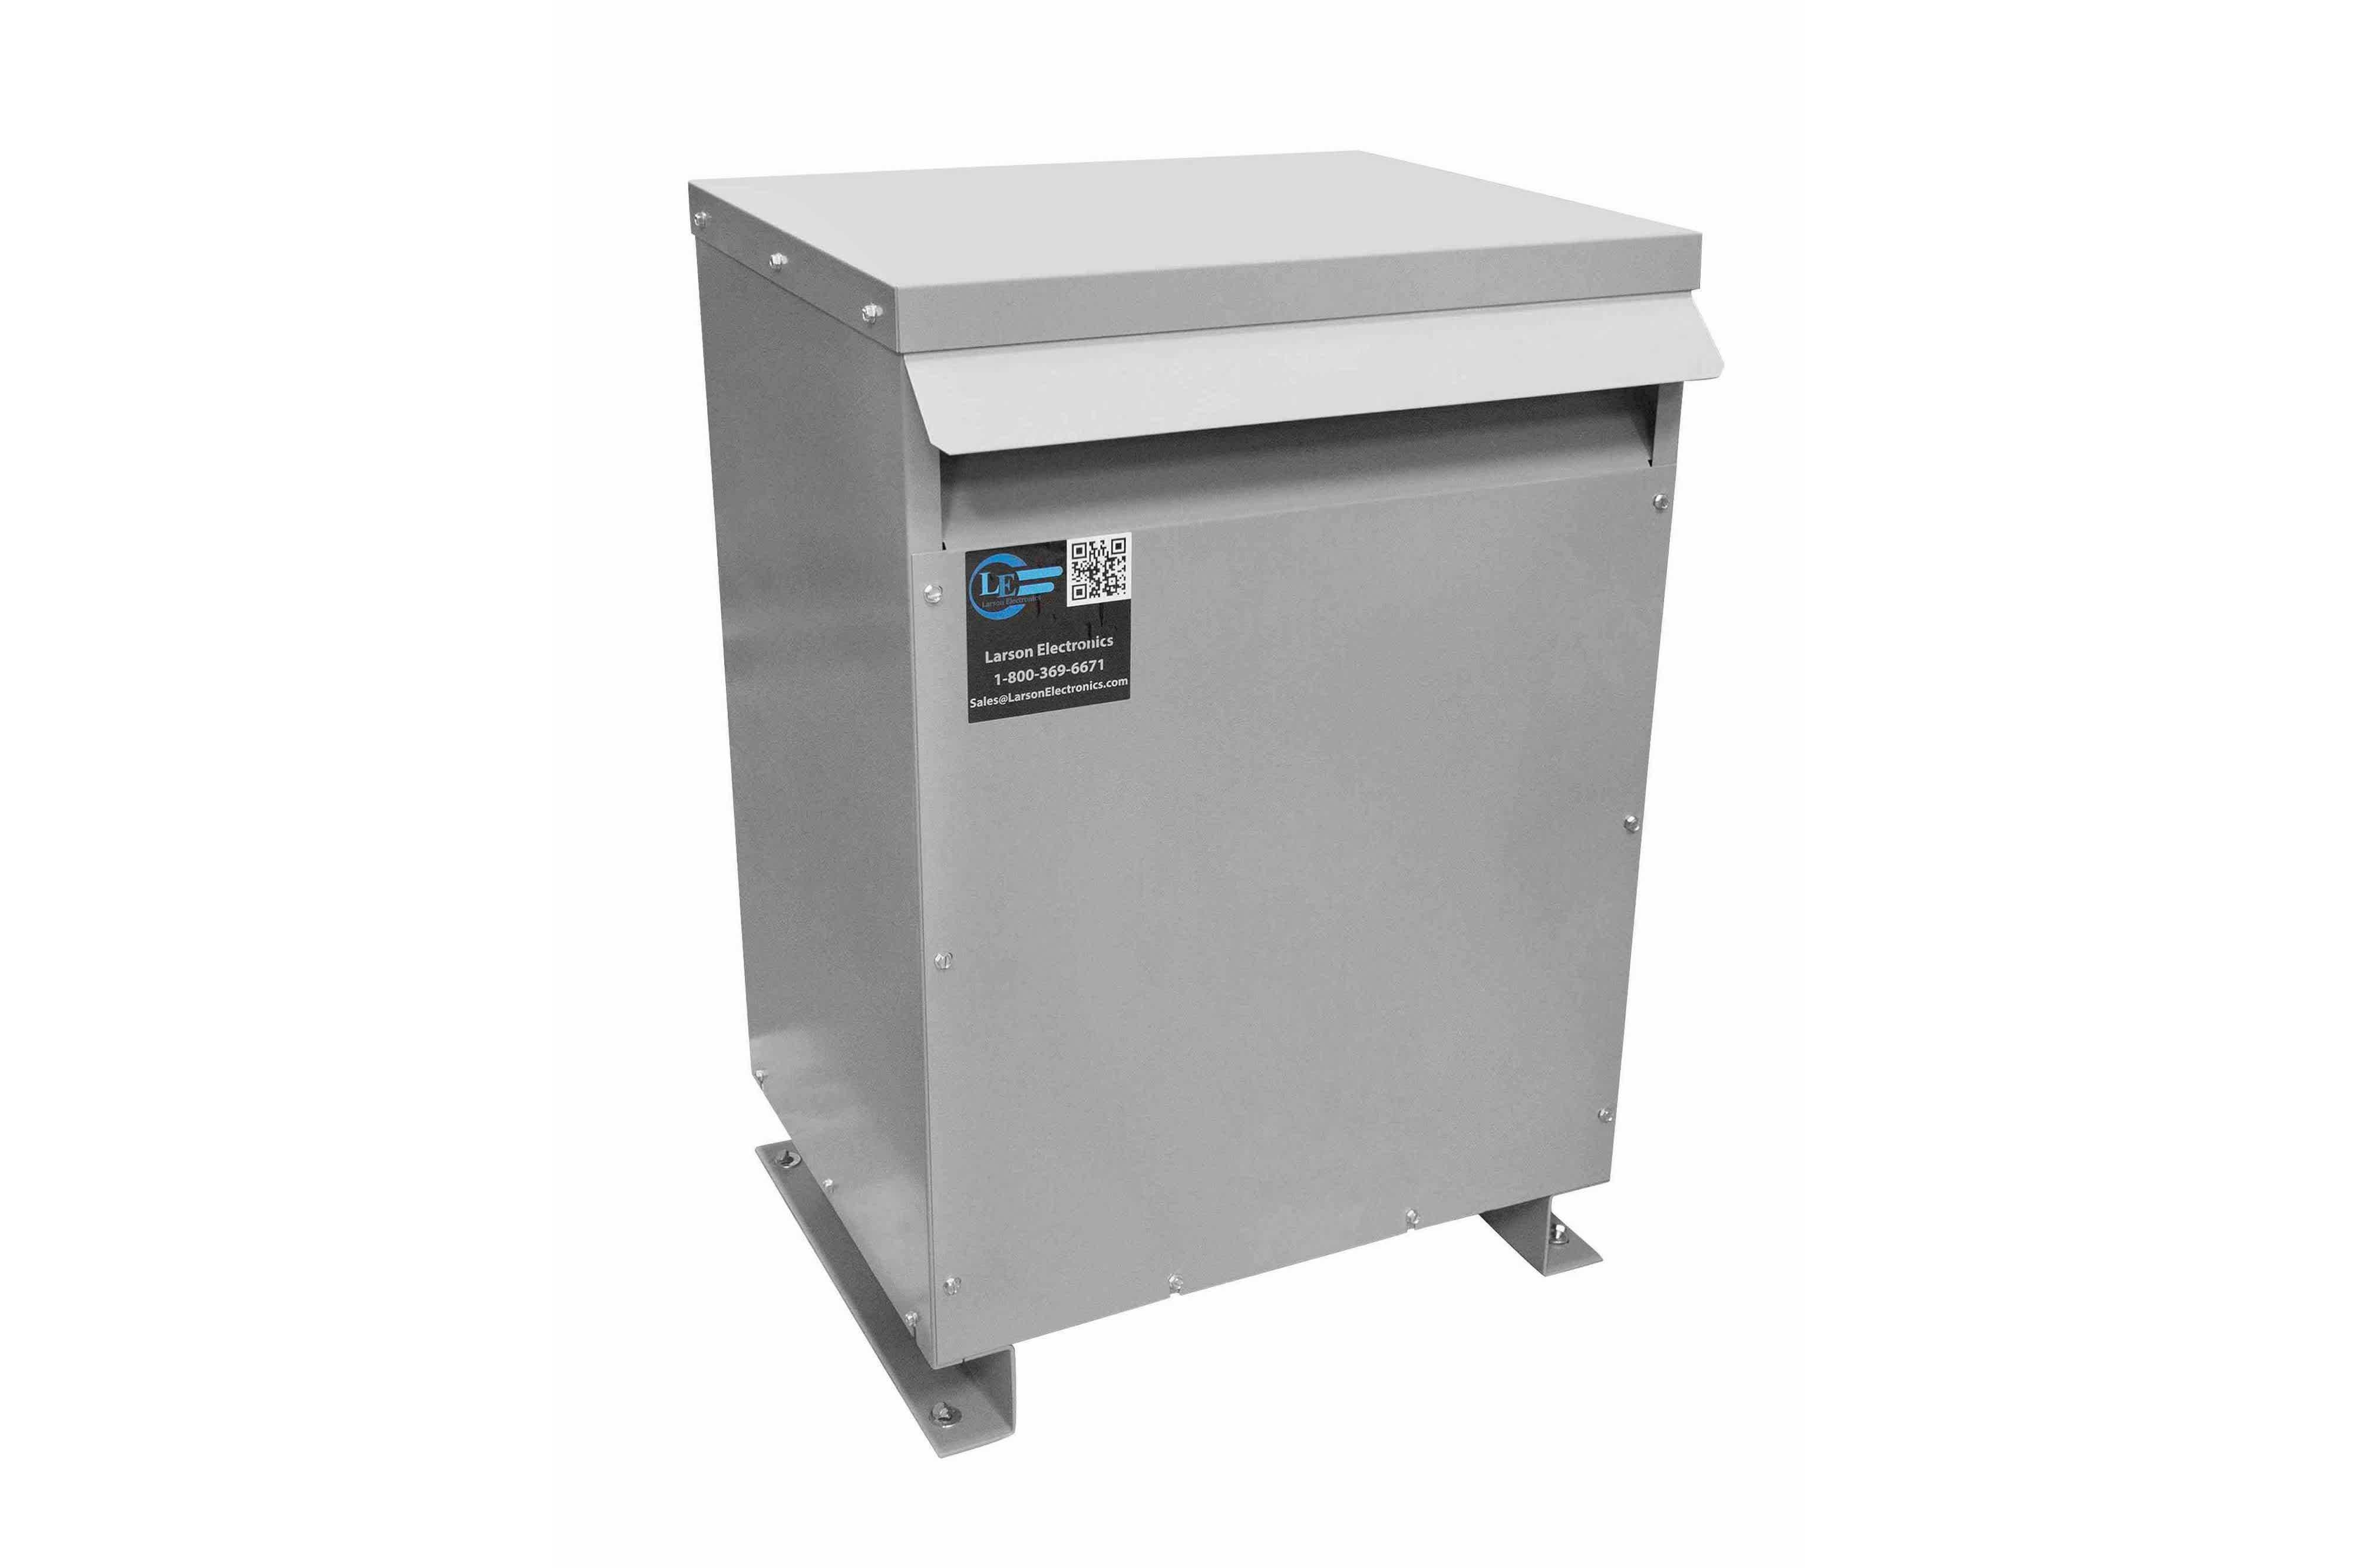 275 kVA 3PH Isolation Transformer, 208V Wye Primary, 480Y/277 Wye-N Secondary, N3R, Ventilated, 60 Hz